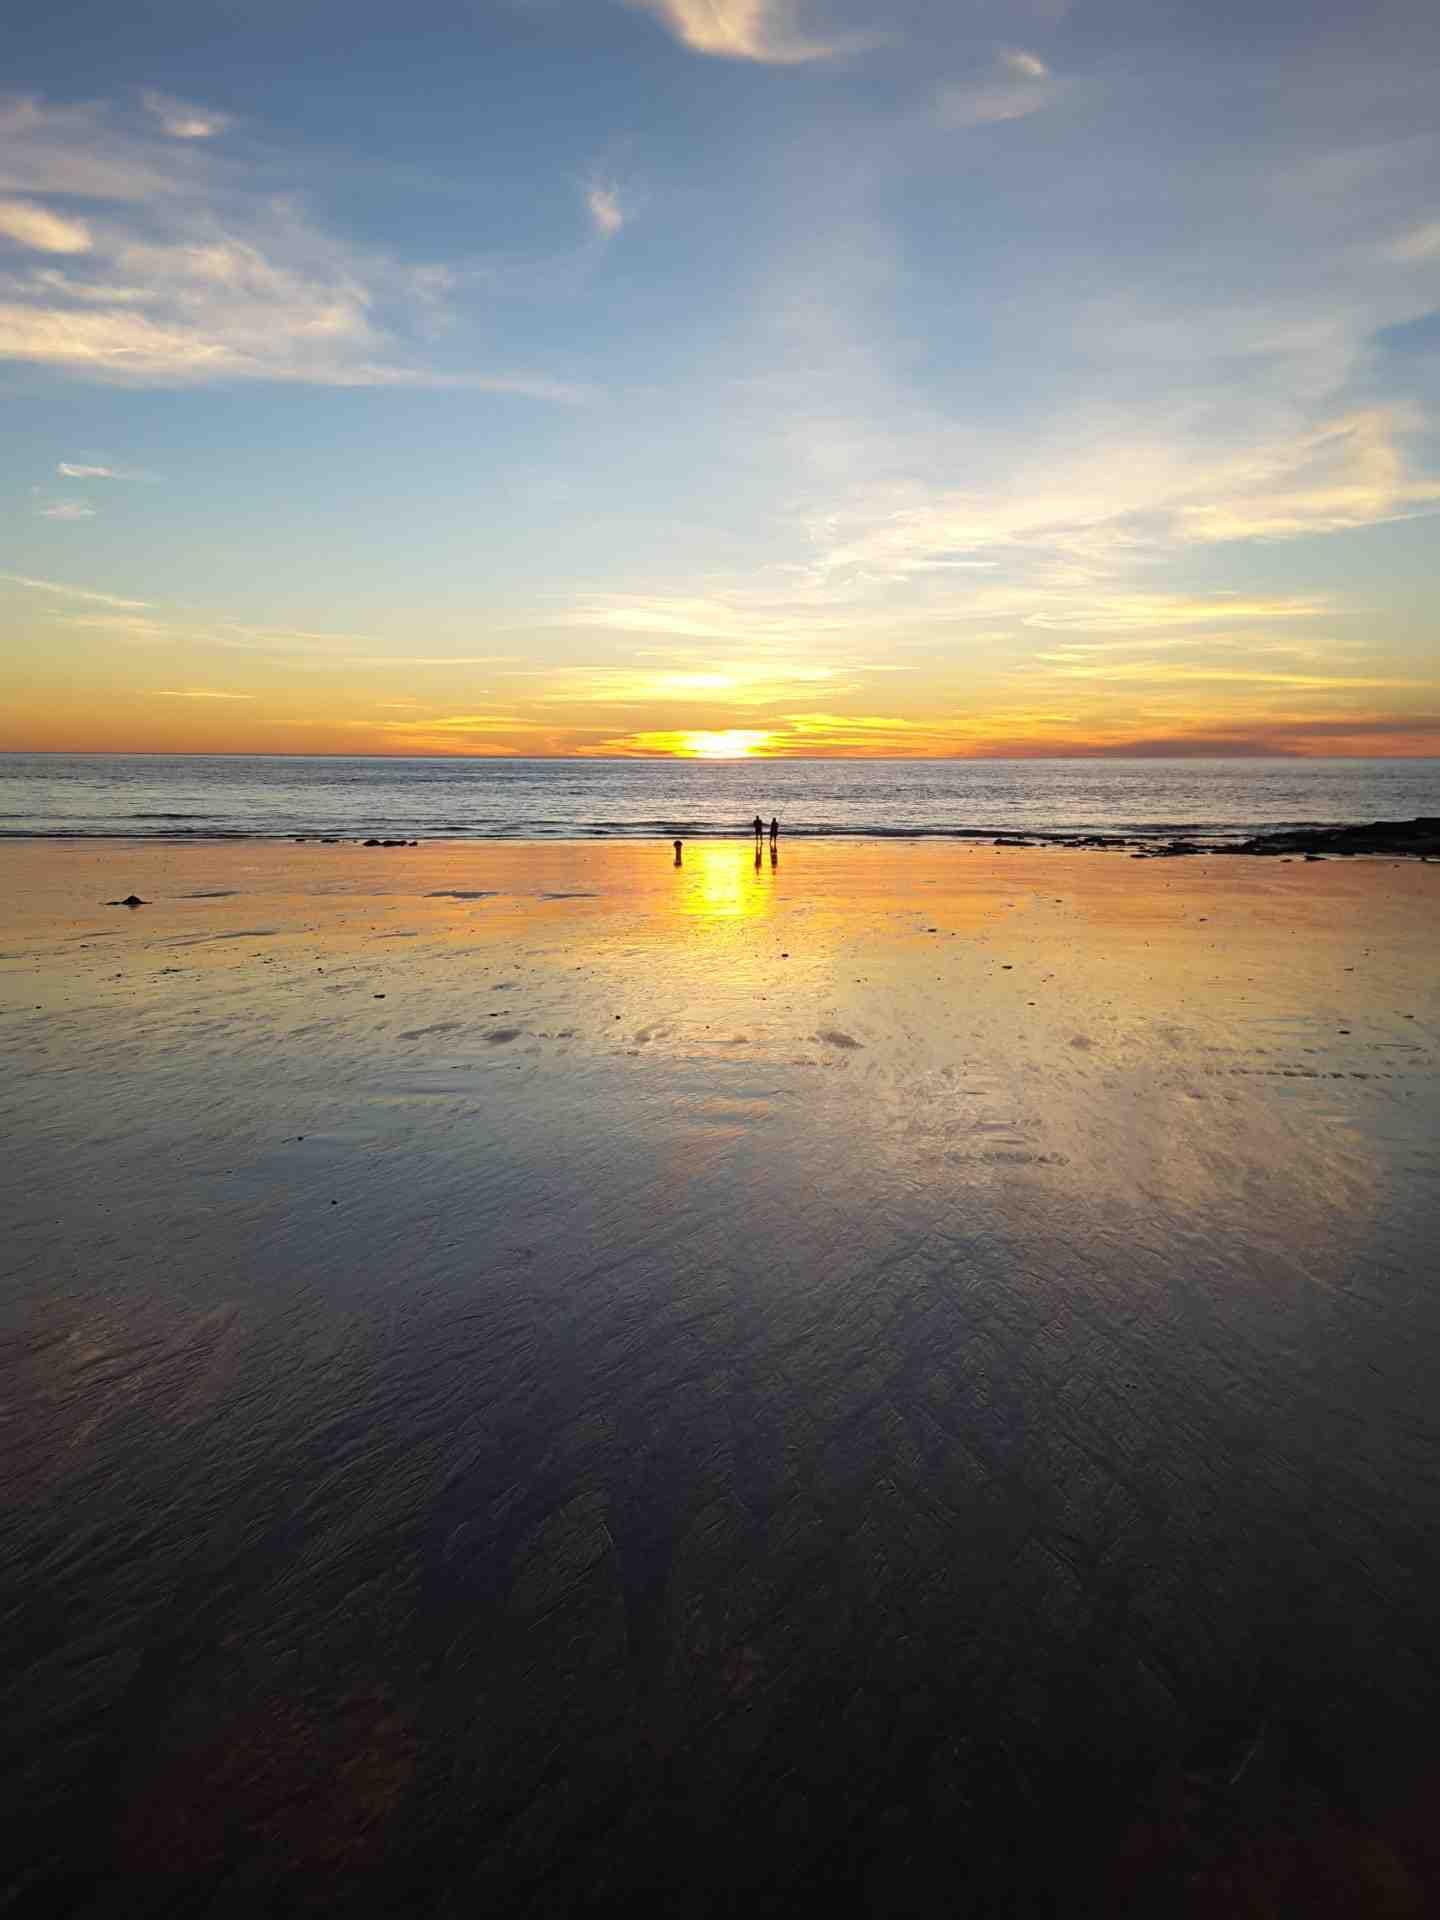 80 Mile Beach - Sunny Afternoon- image credit Stella Macklin